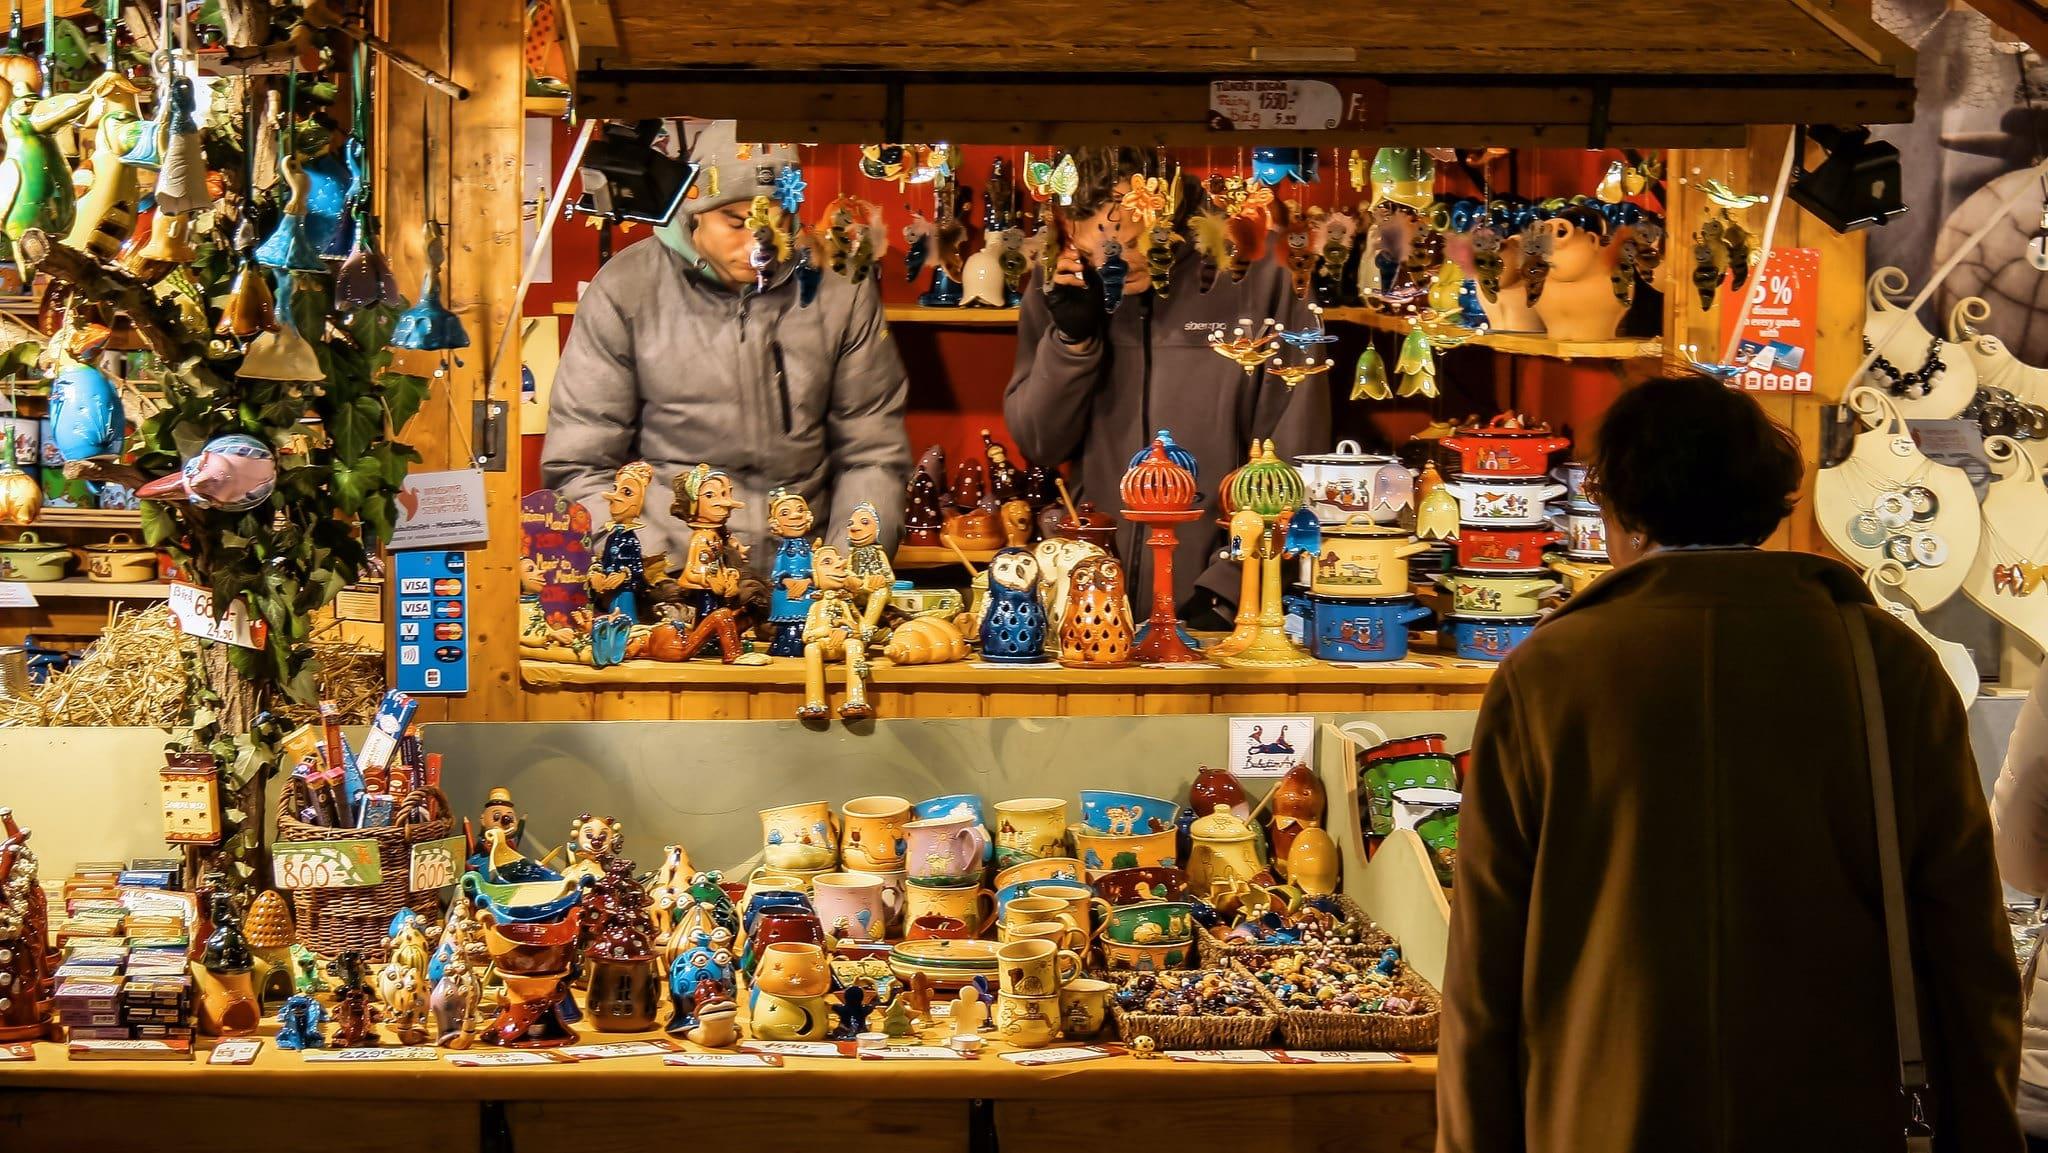 Kerstkraam in Boedapest